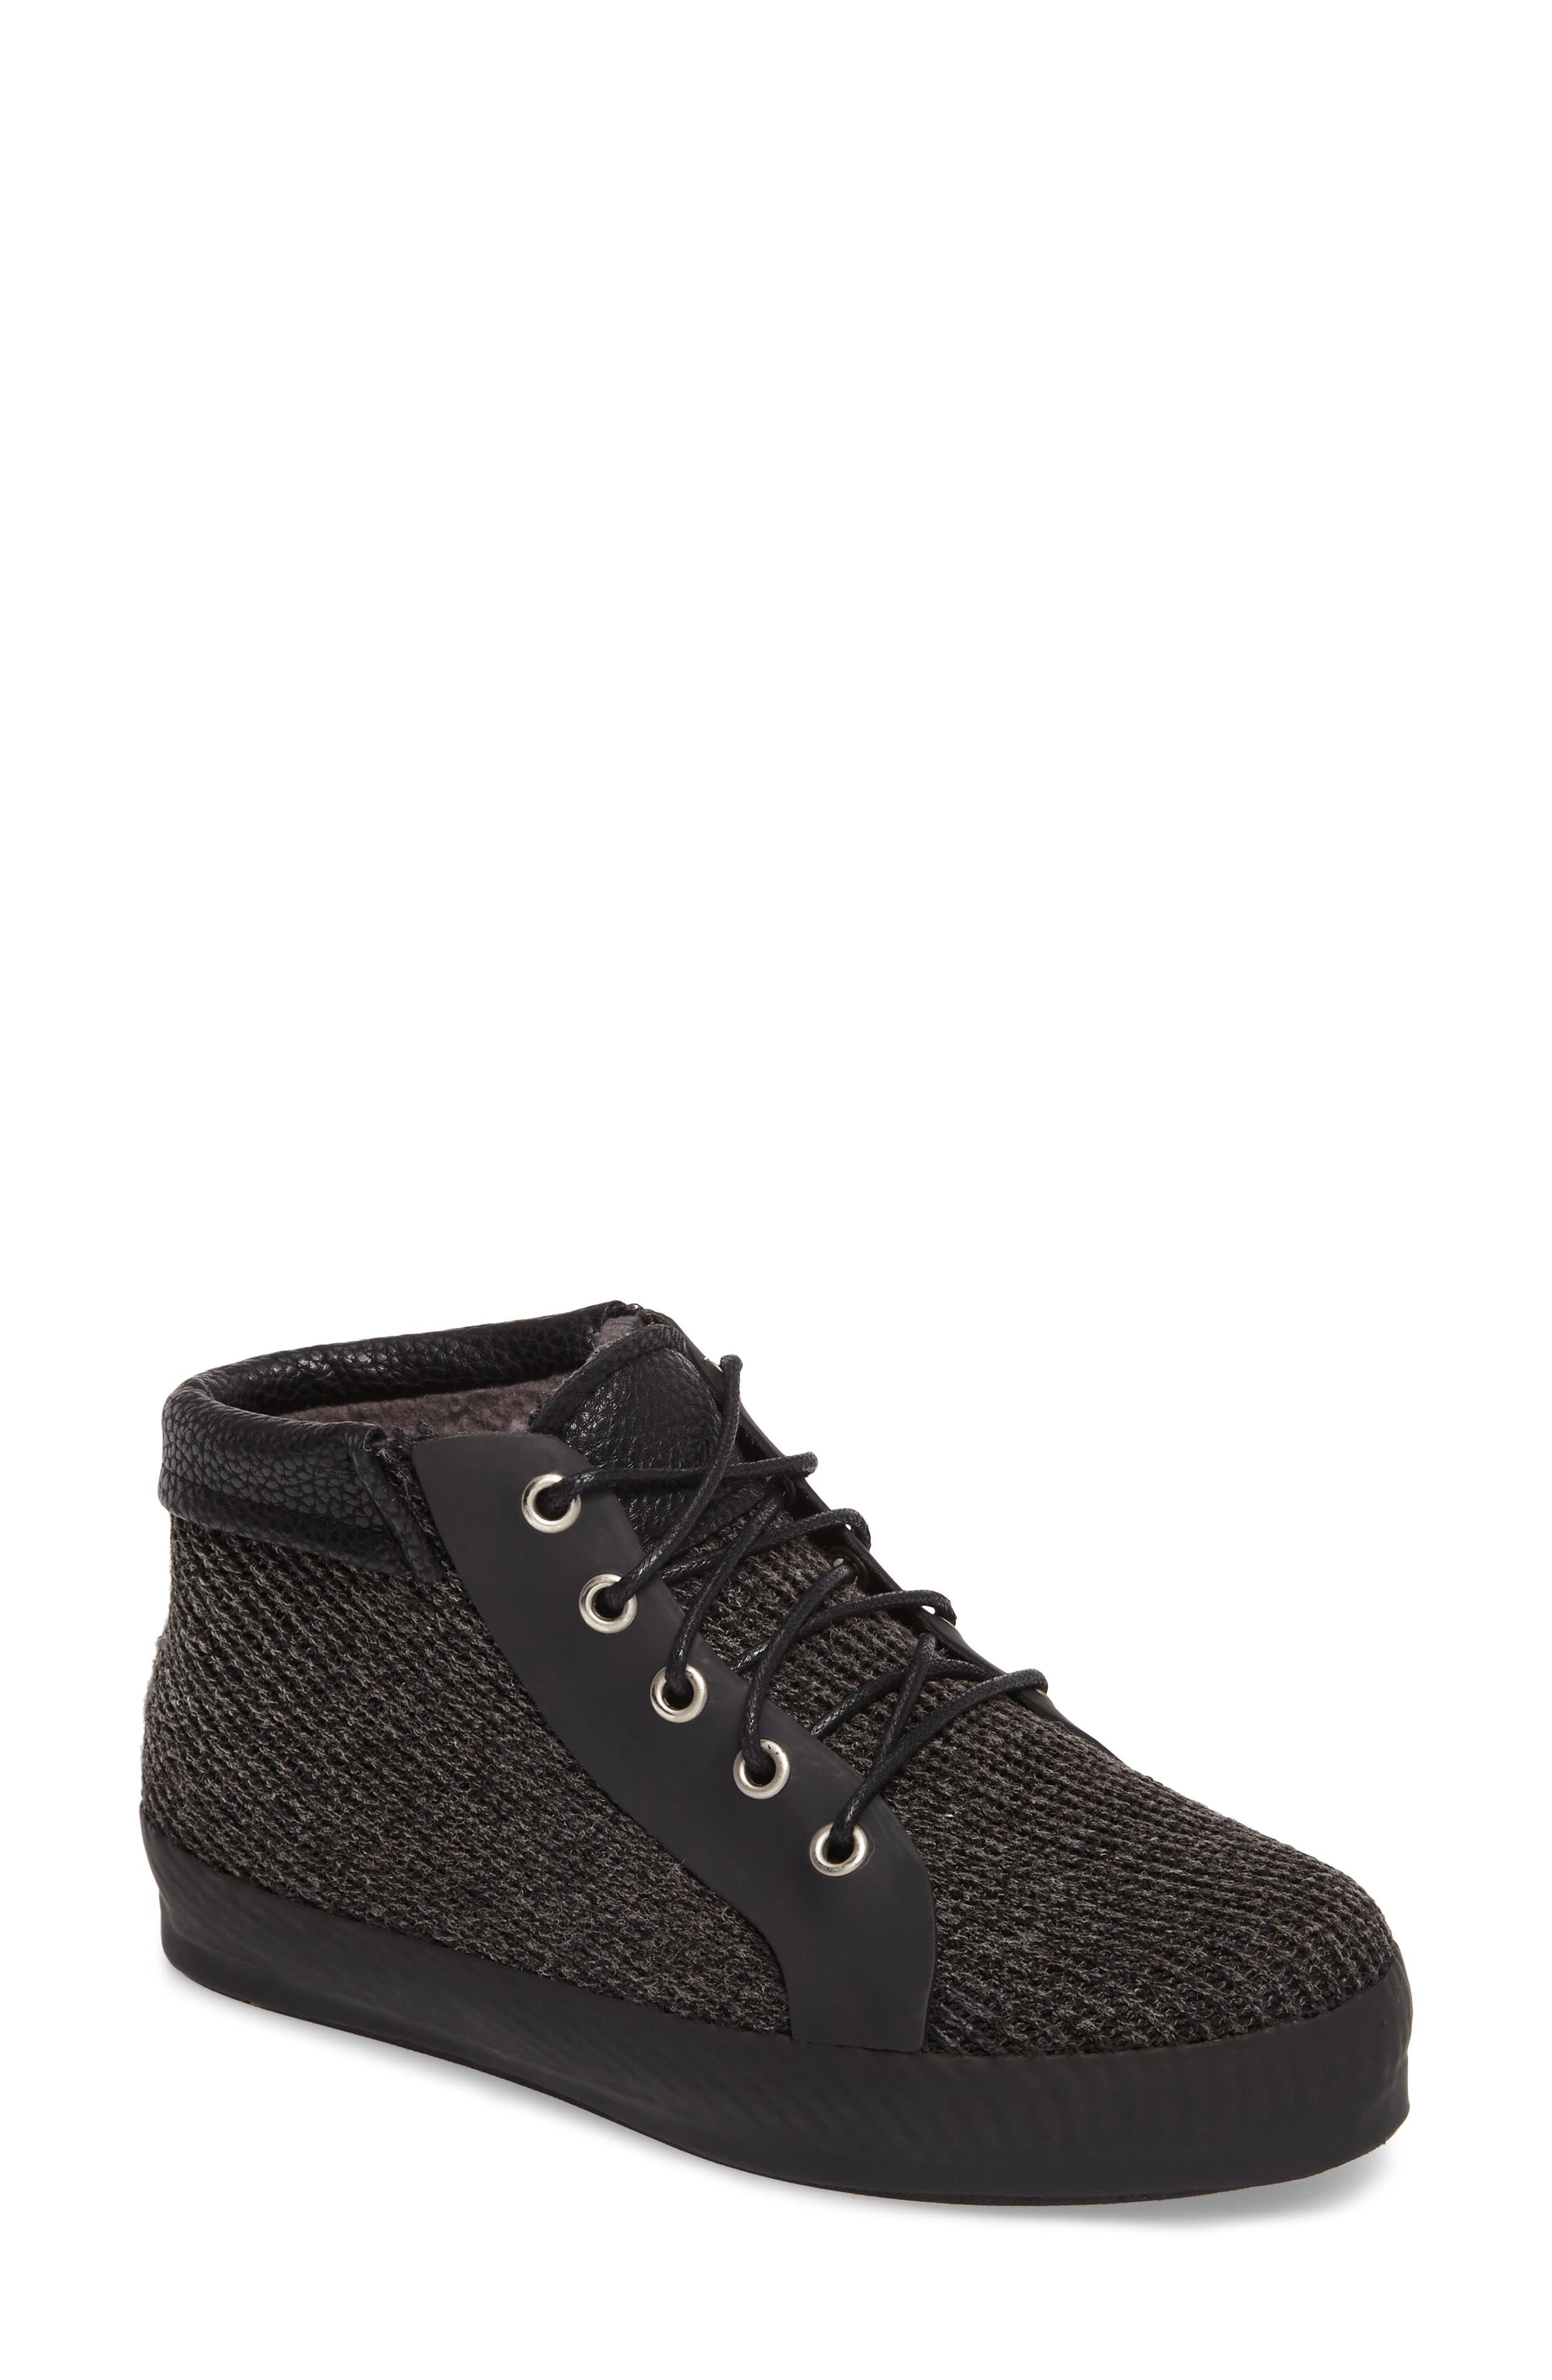 Hampton Waterproof Mid Sneaker,                             Main thumbnail 1, color,                             Black Fabric